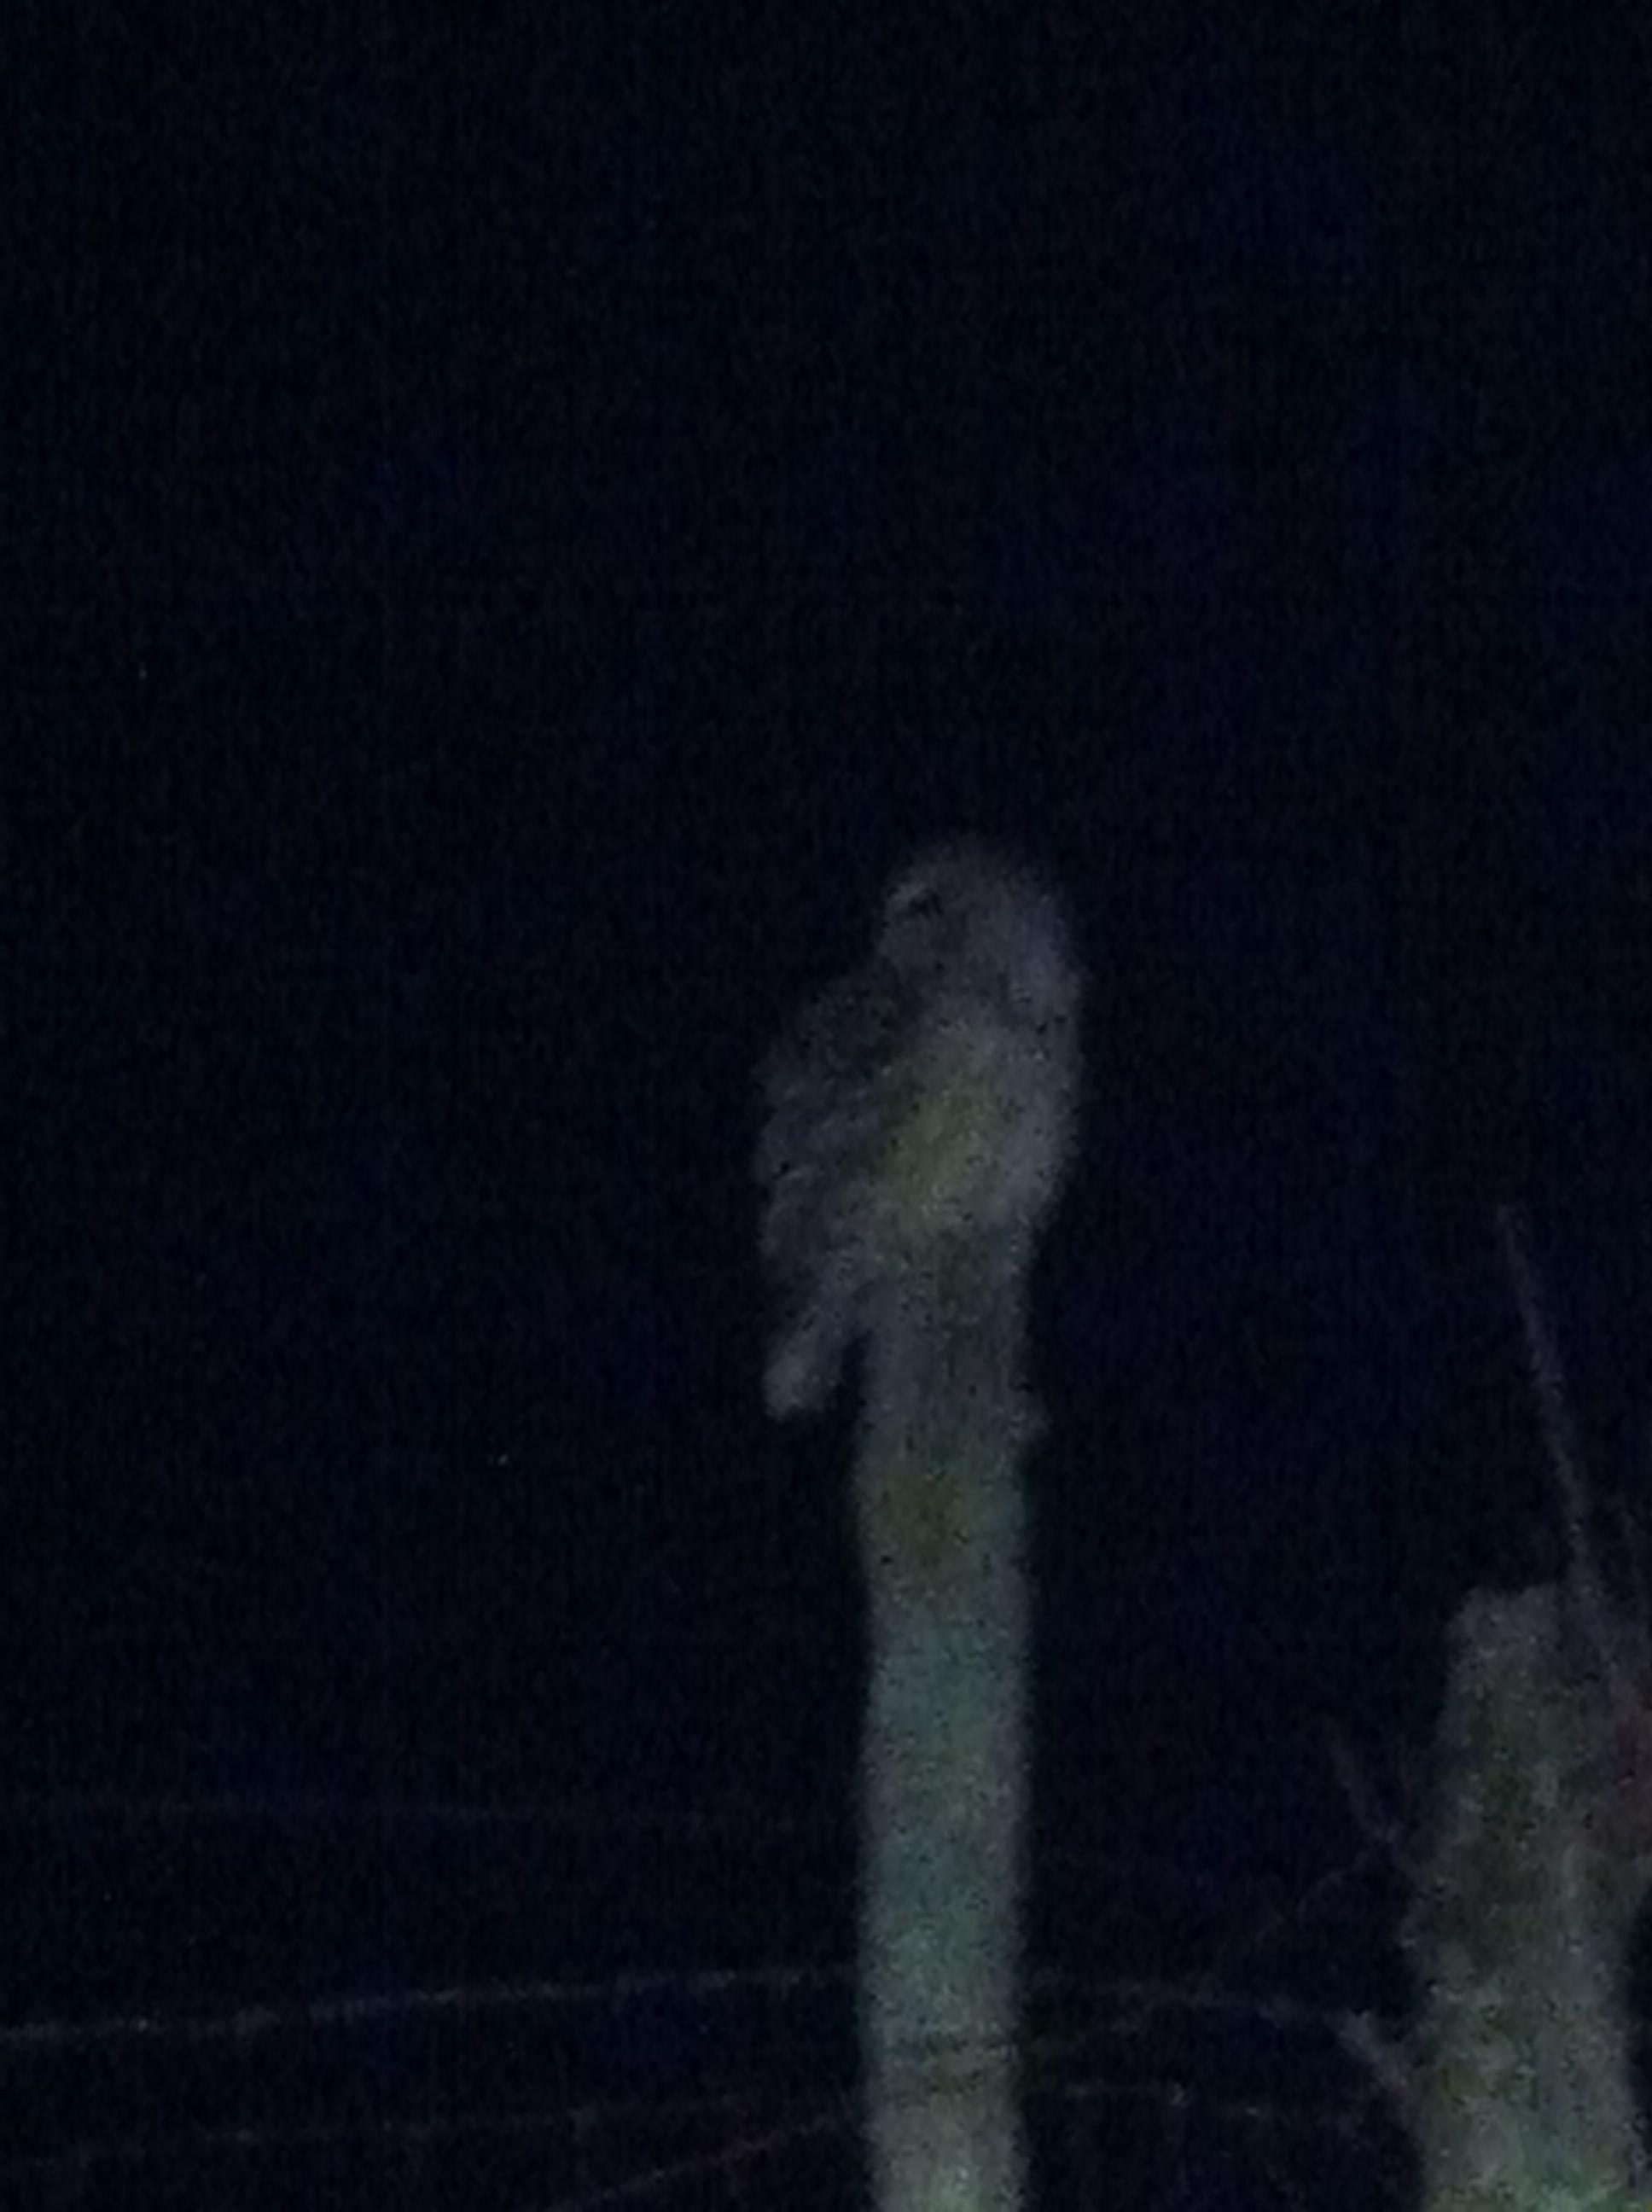 Barred owl near our house